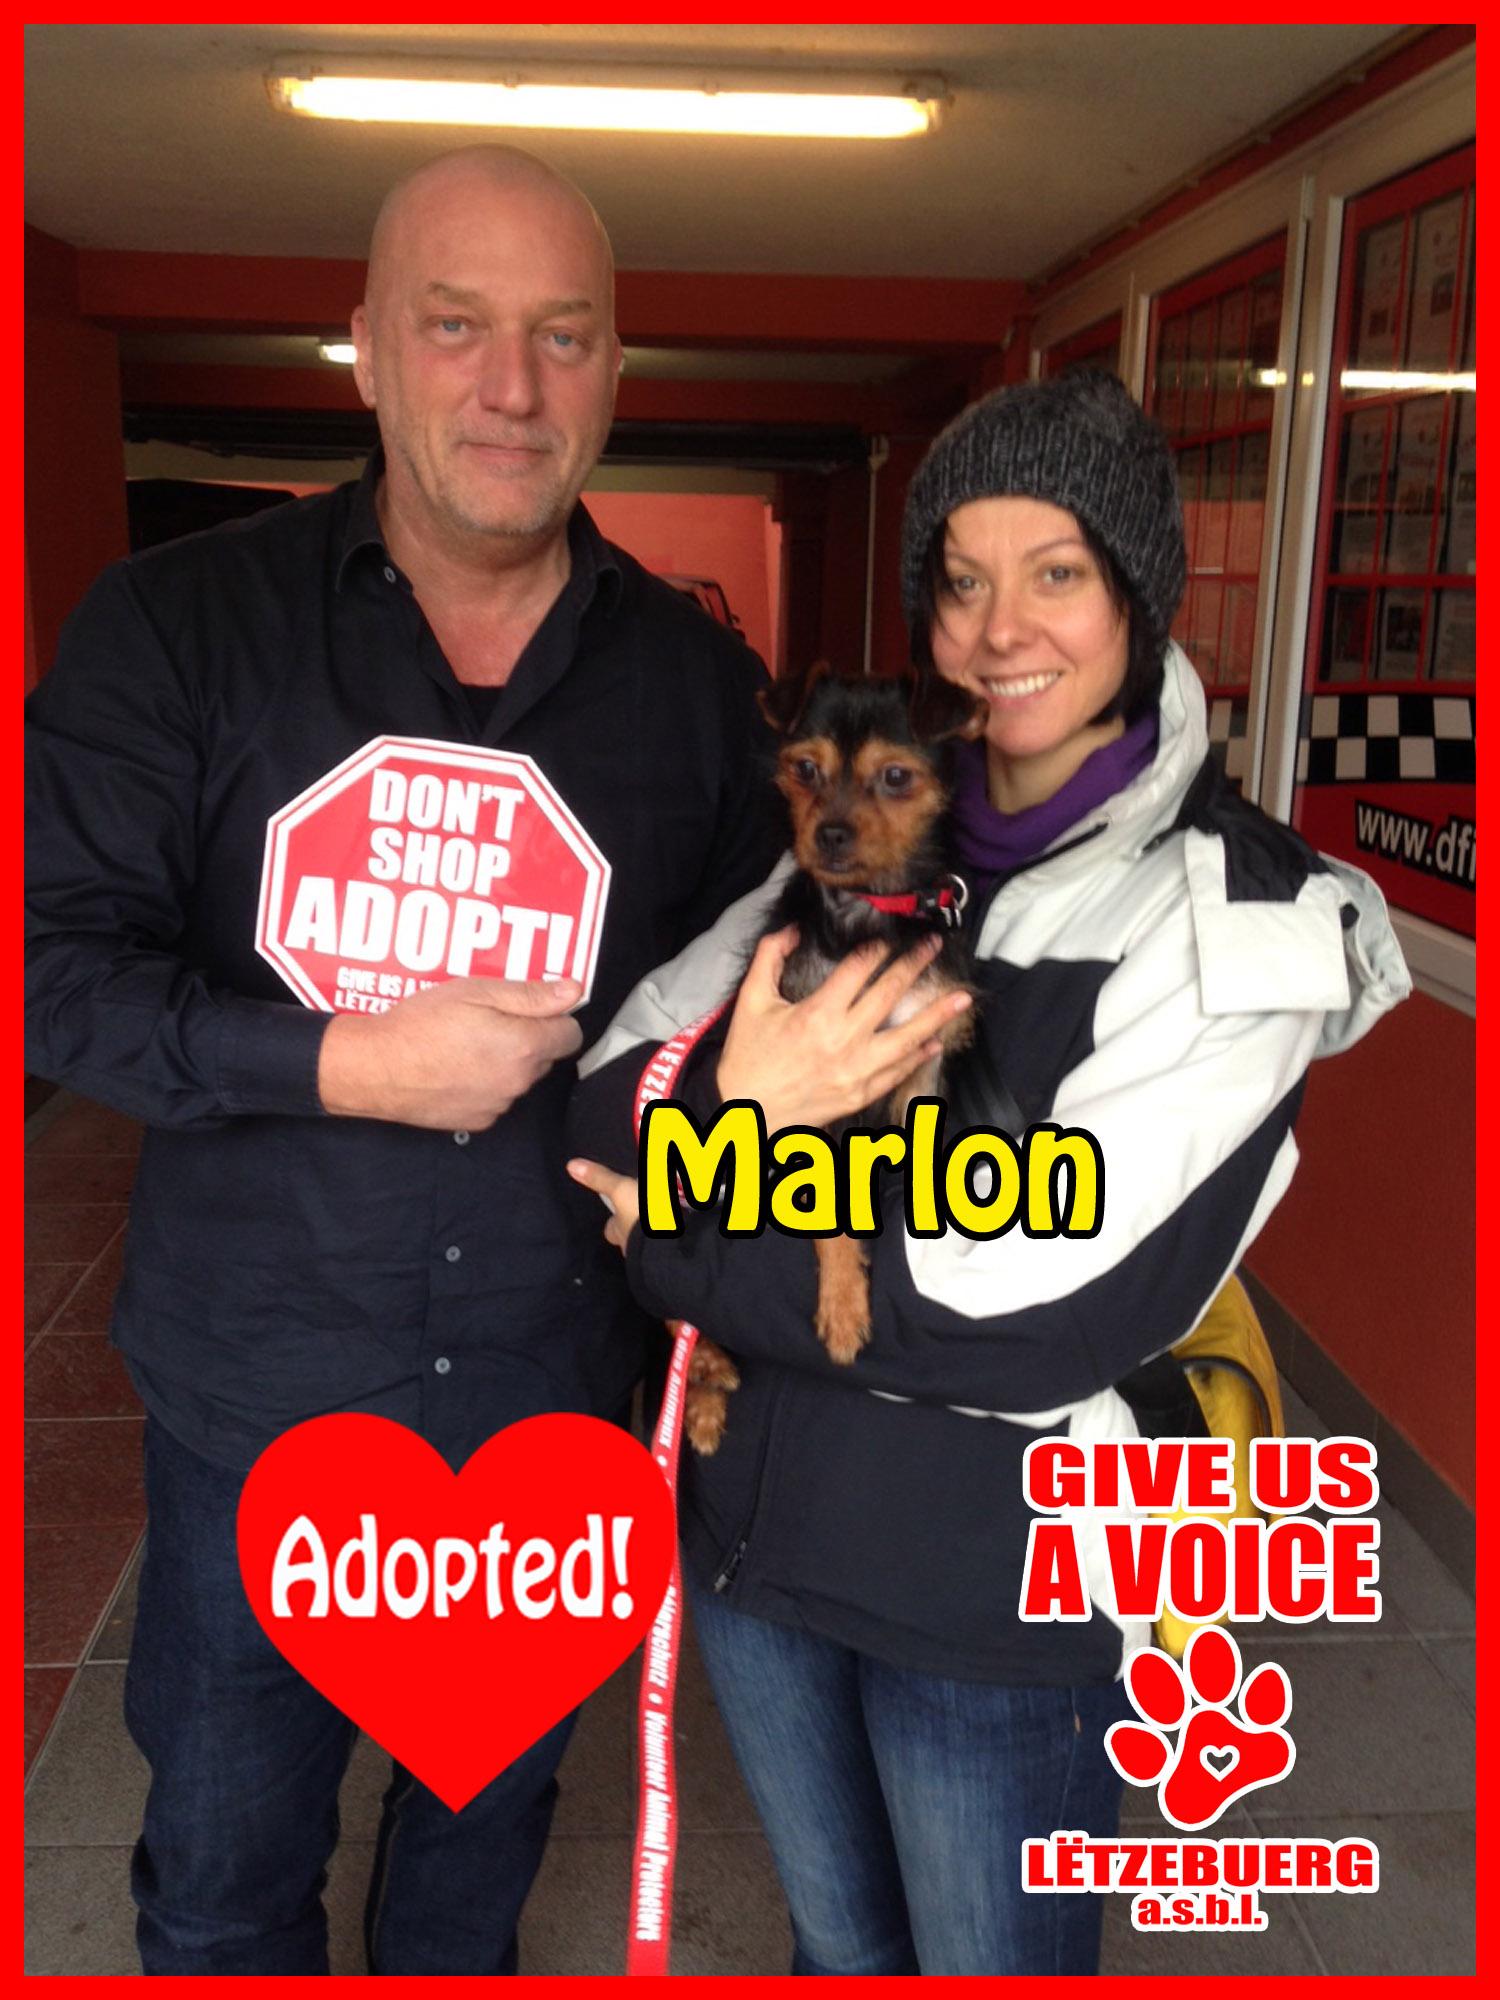 Marlon Adopted! copy